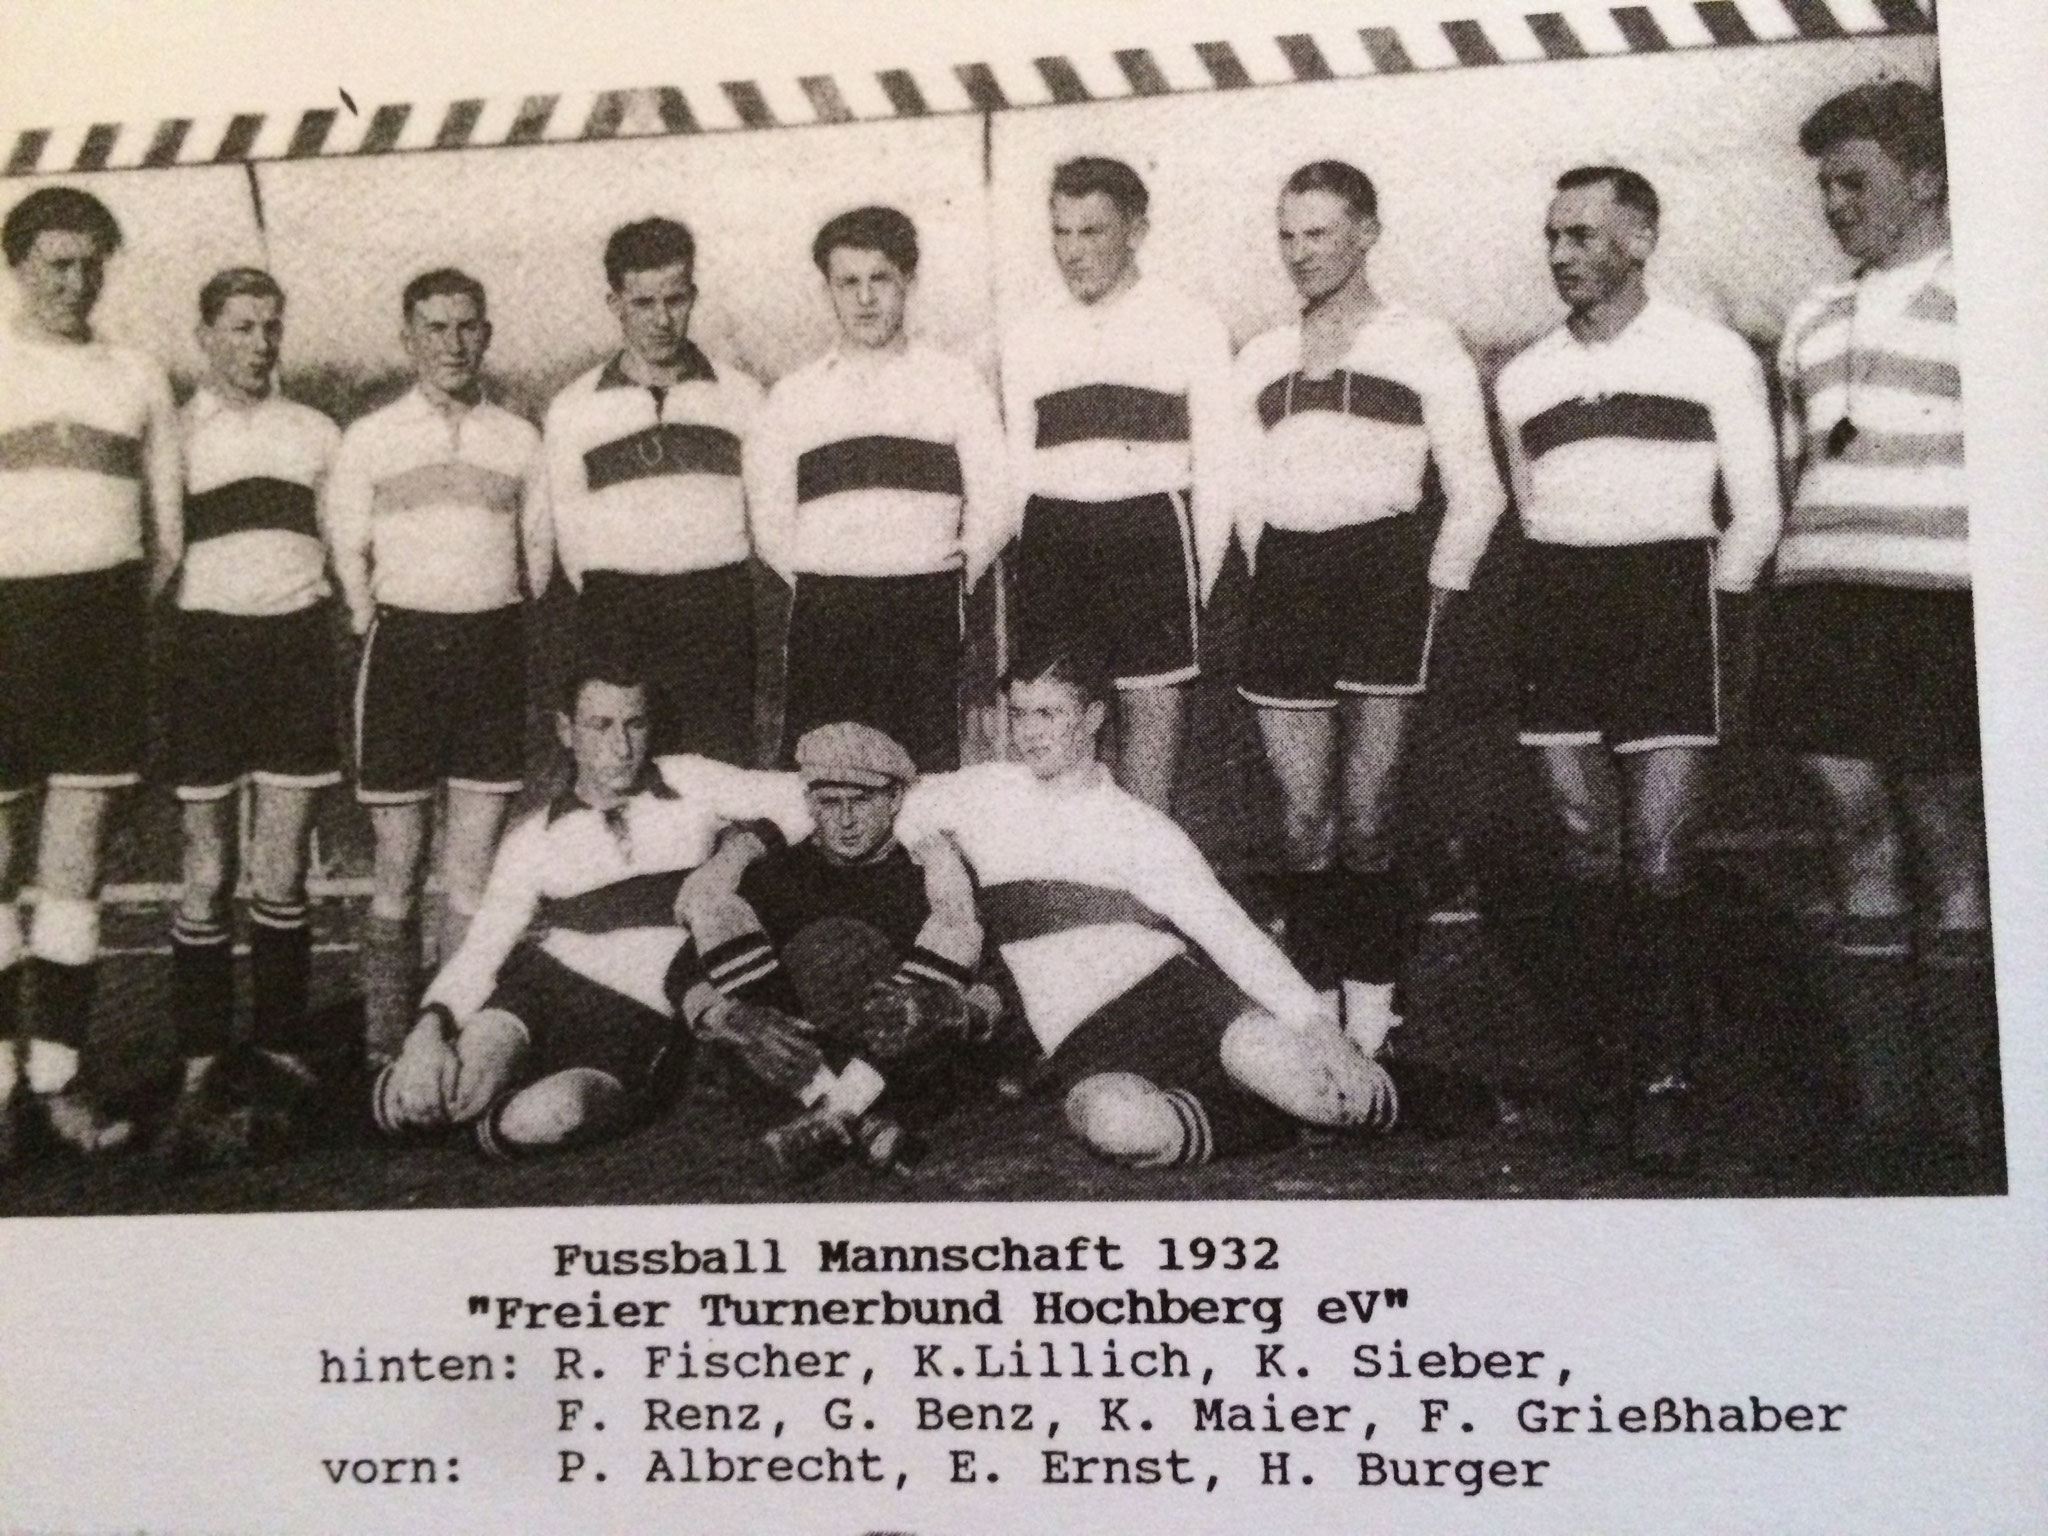 Fußball 1932